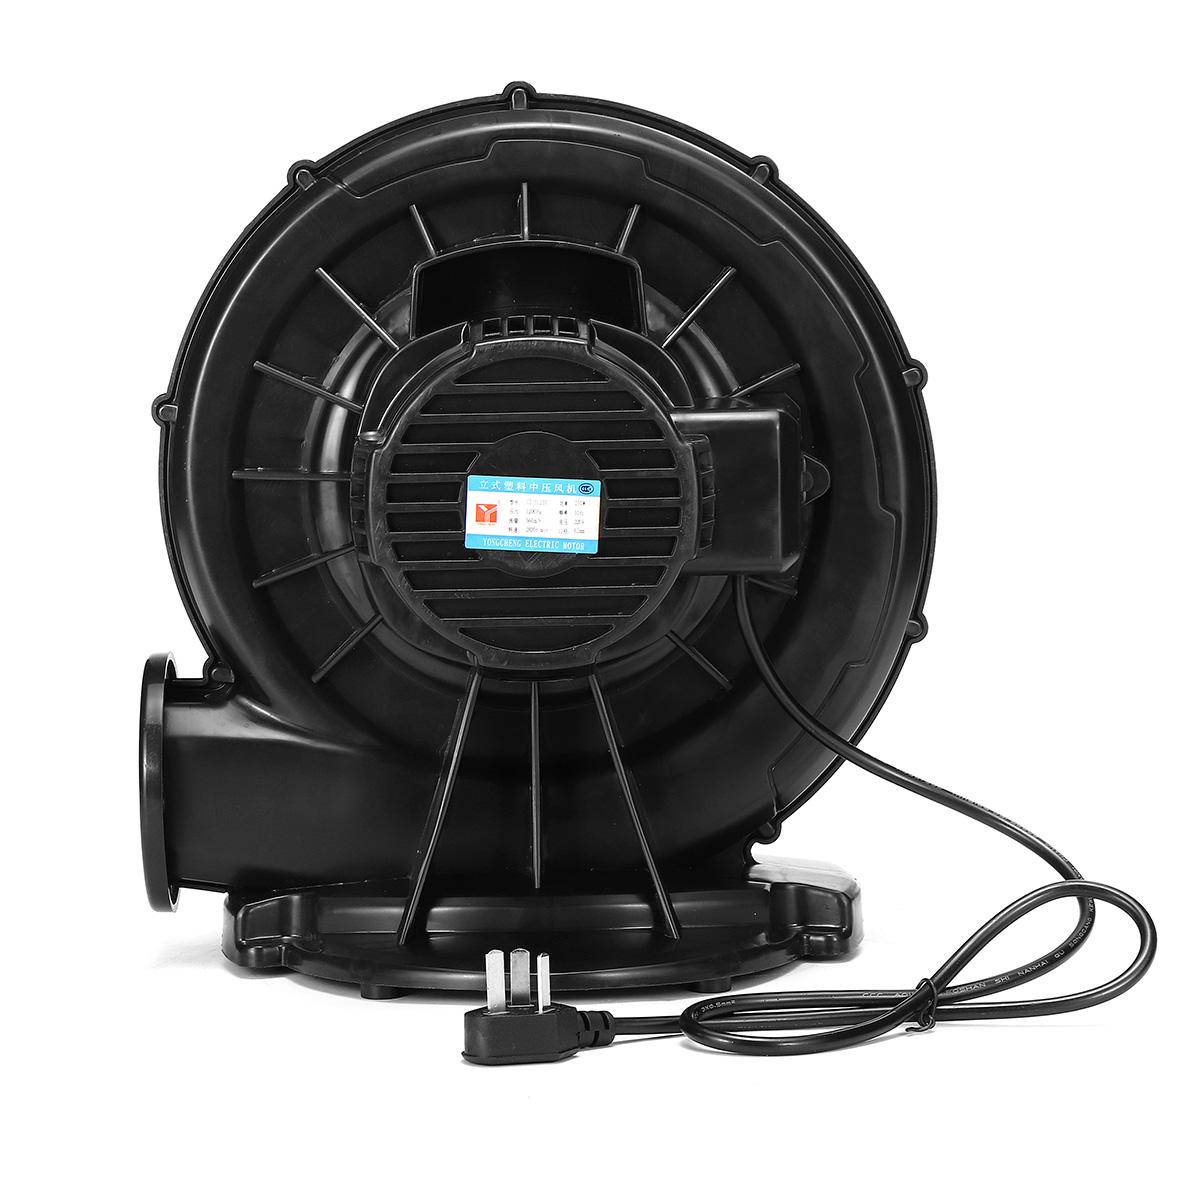 250W-750W 220V Air Duster Blower Pump Fan Powerful Blower Machine Pump Inflatable Screen Blower